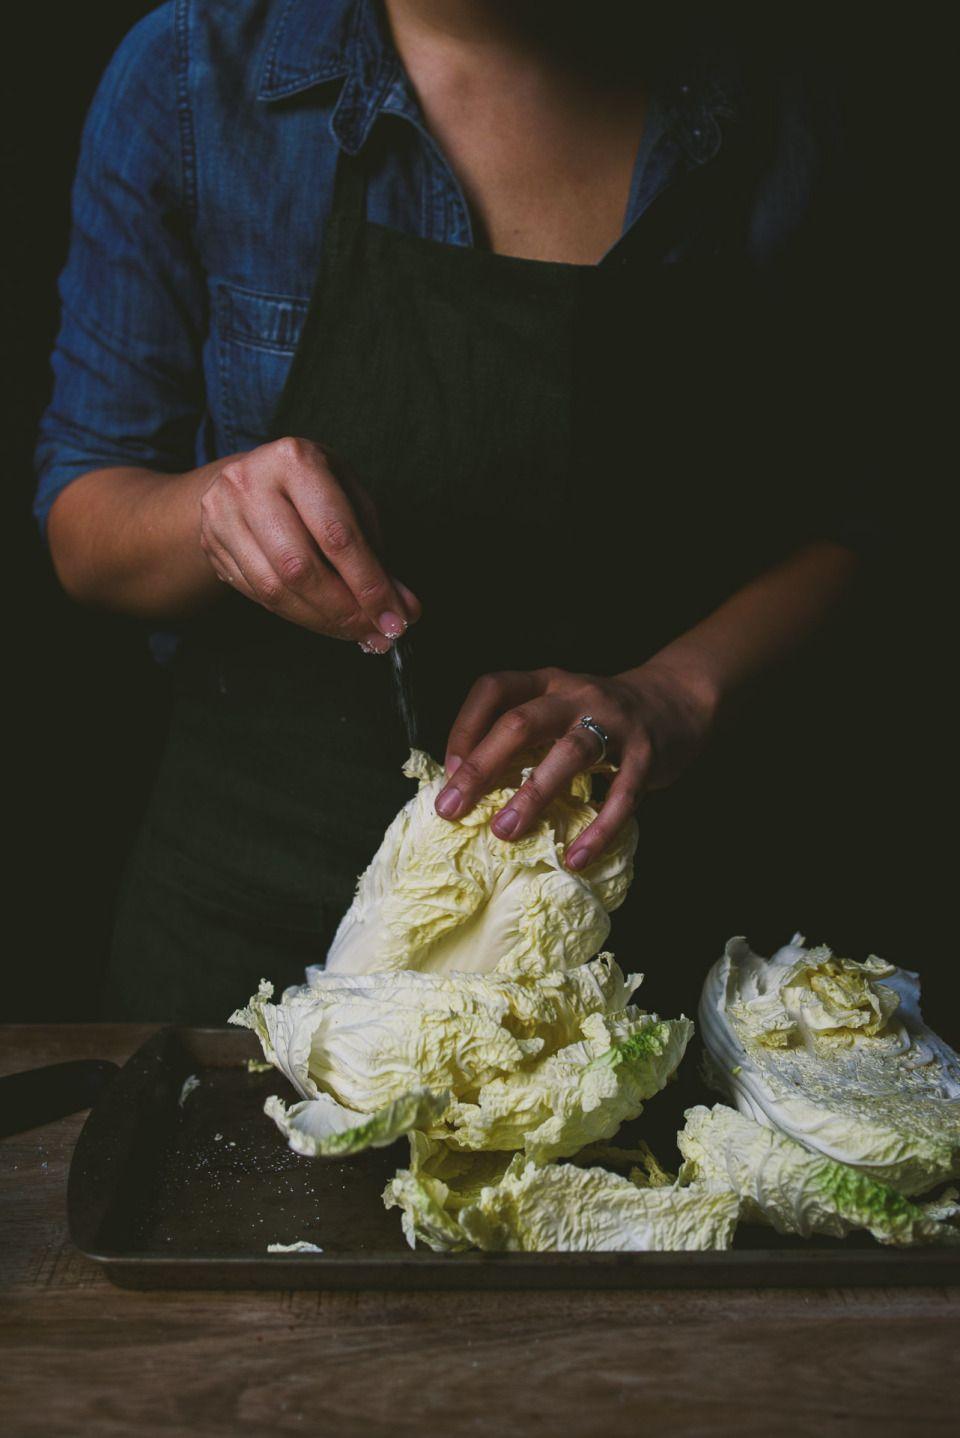 Homemade baechoo kimchi and bossam best food photography